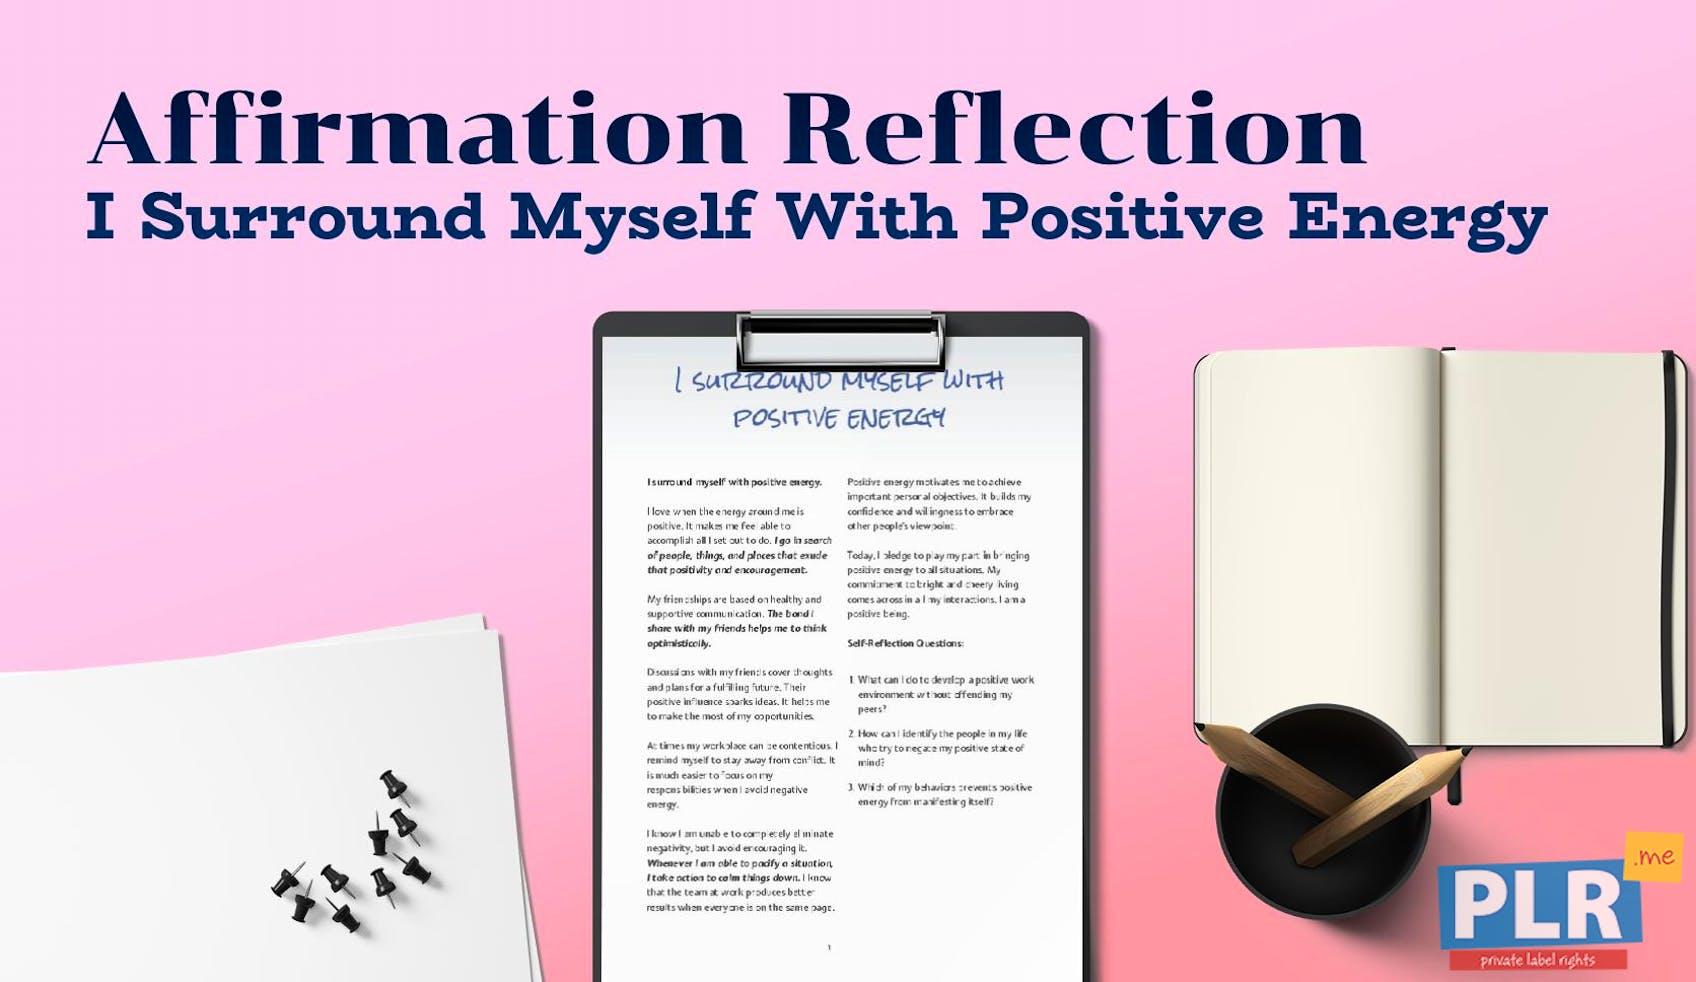 I Surround Myself With Positive Energy